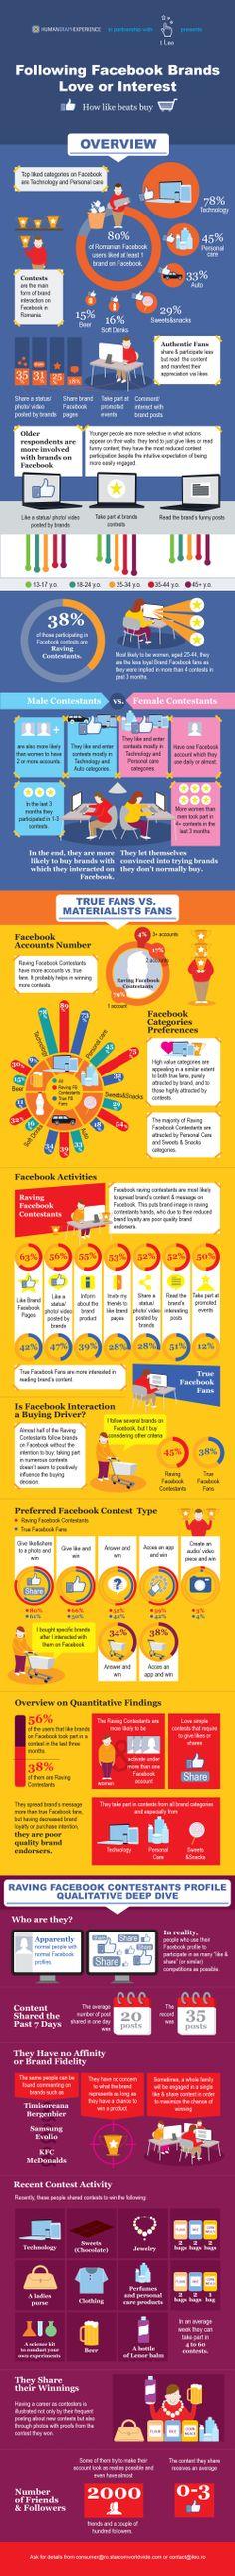 Following Facebook Brands: Love or Interest?